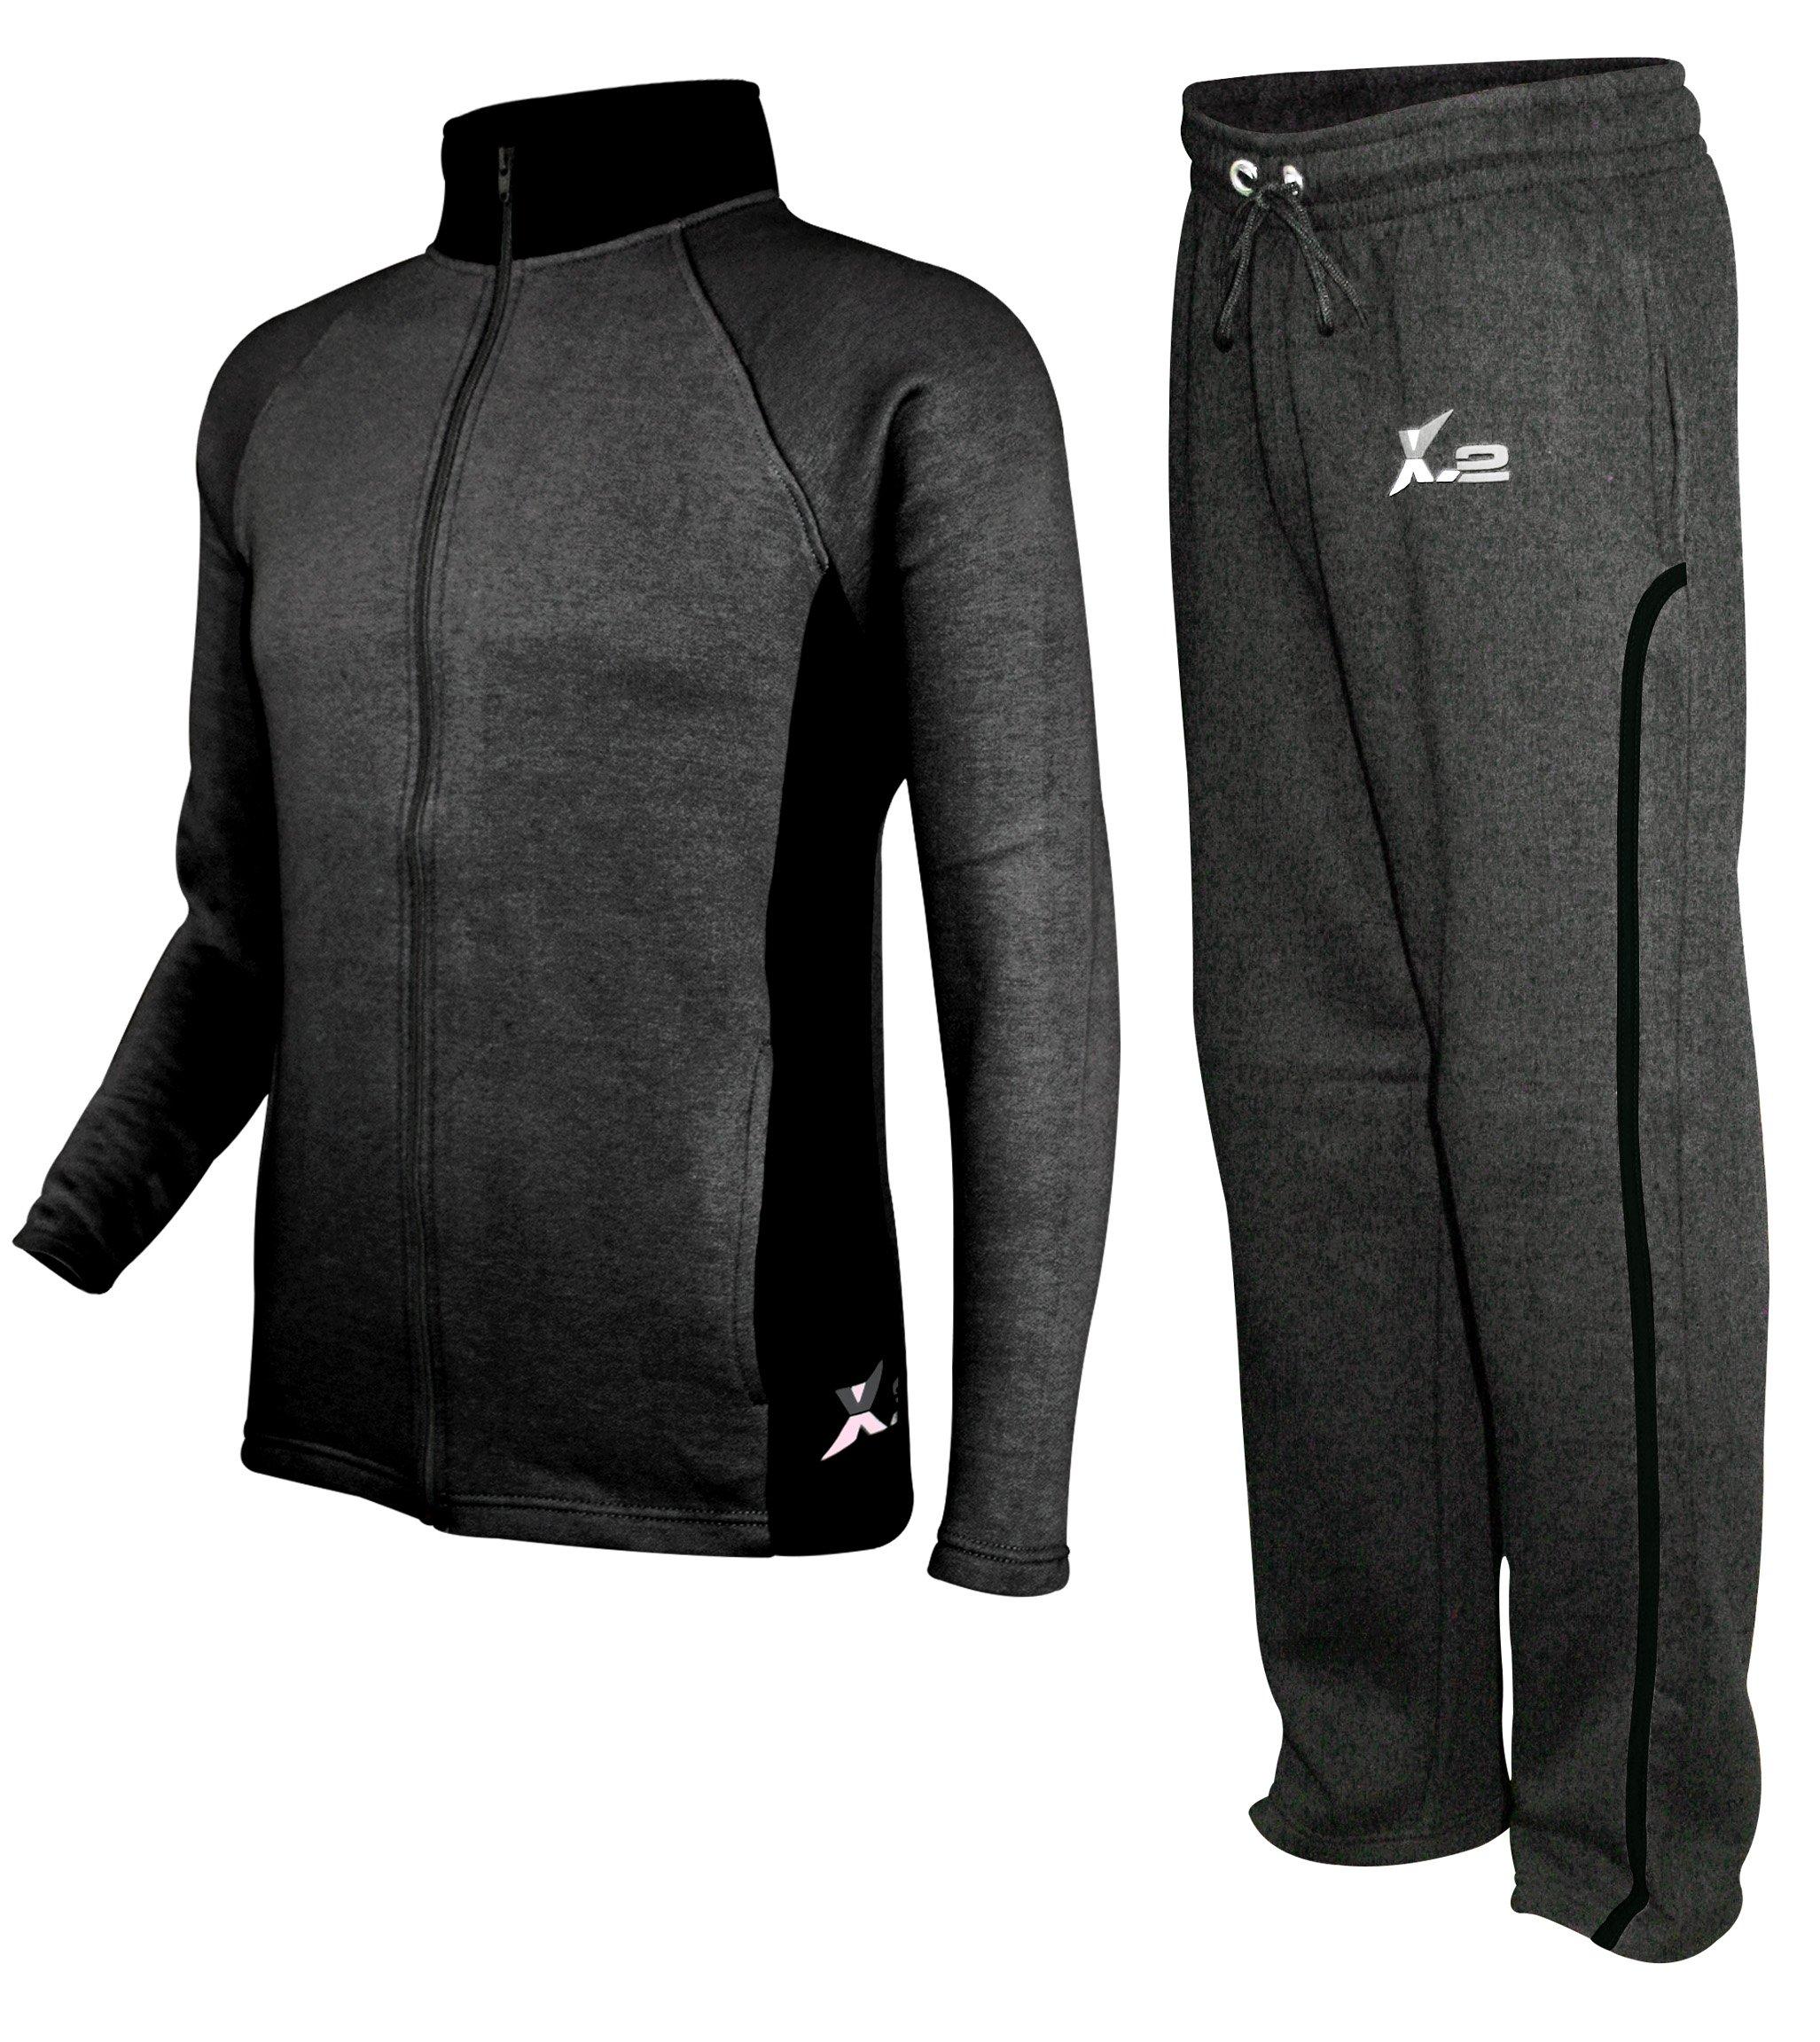 X-2 Mens Athletic Fleece Tracksuit Jogging Sweatsuit Activewear CharBlack XXXL